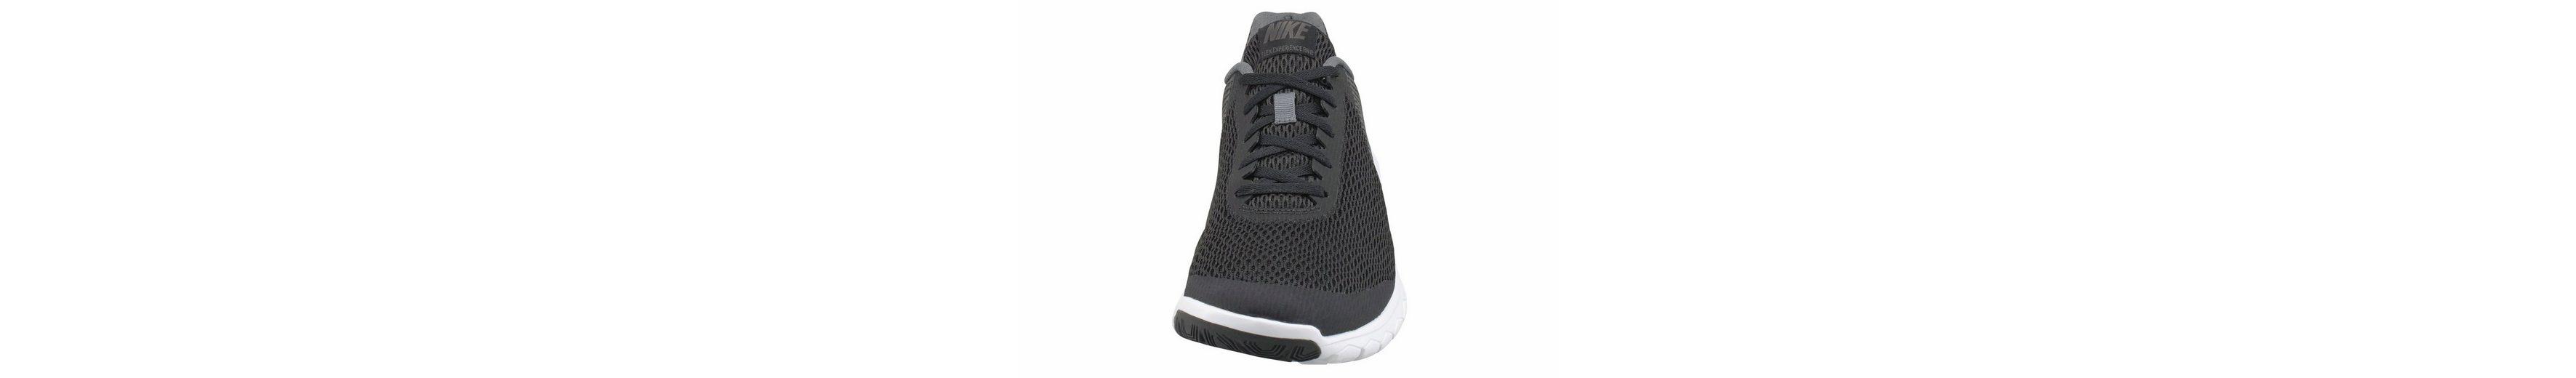 Experience Experience Laufschuh Flex Nike RN Nike Flex q8UIFU